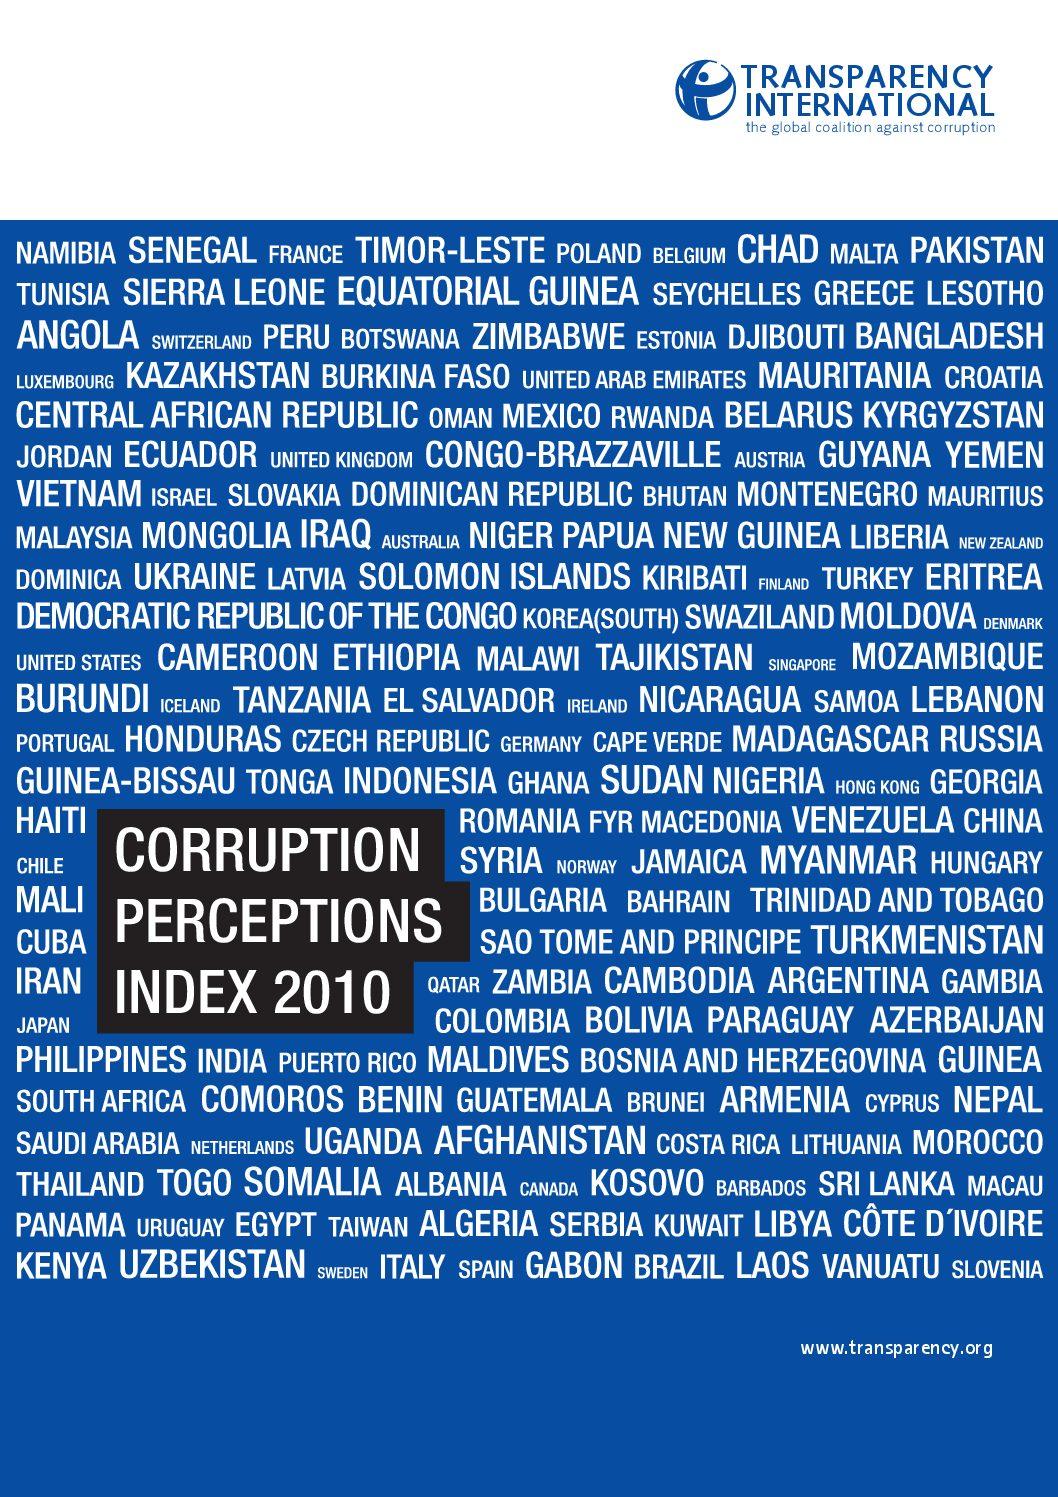 Corruption Perception Index 2010